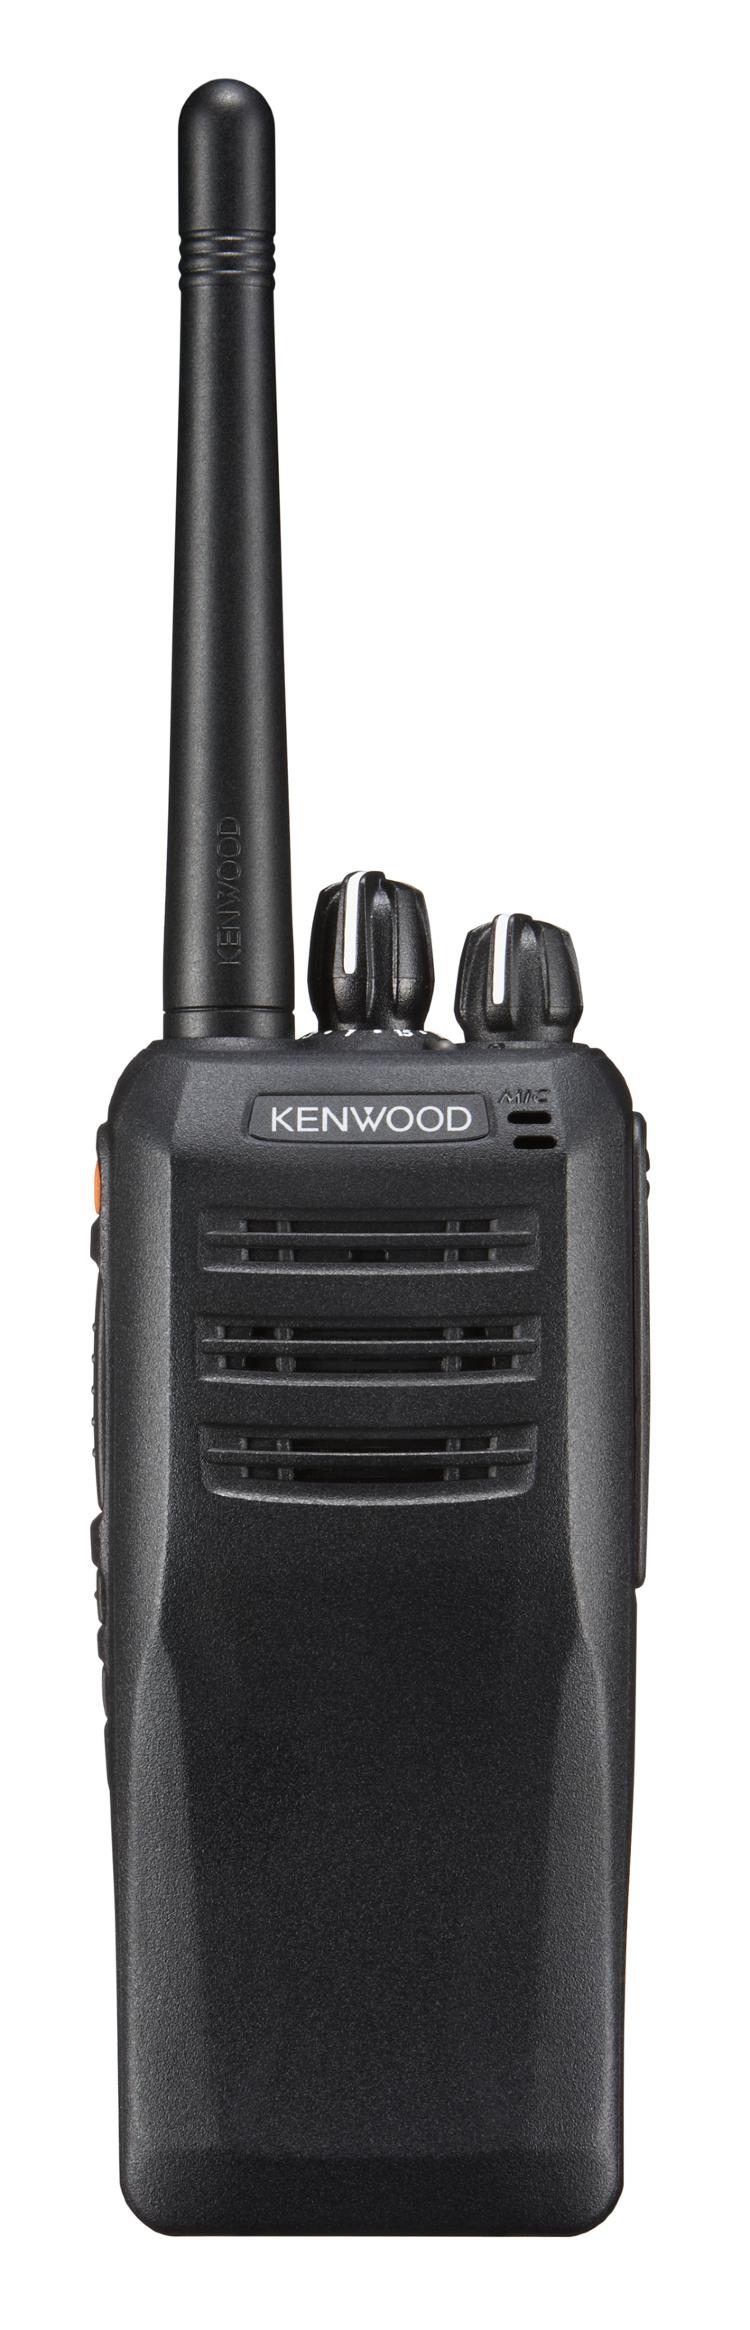 Bộ đàm KENWOOD TK-2168